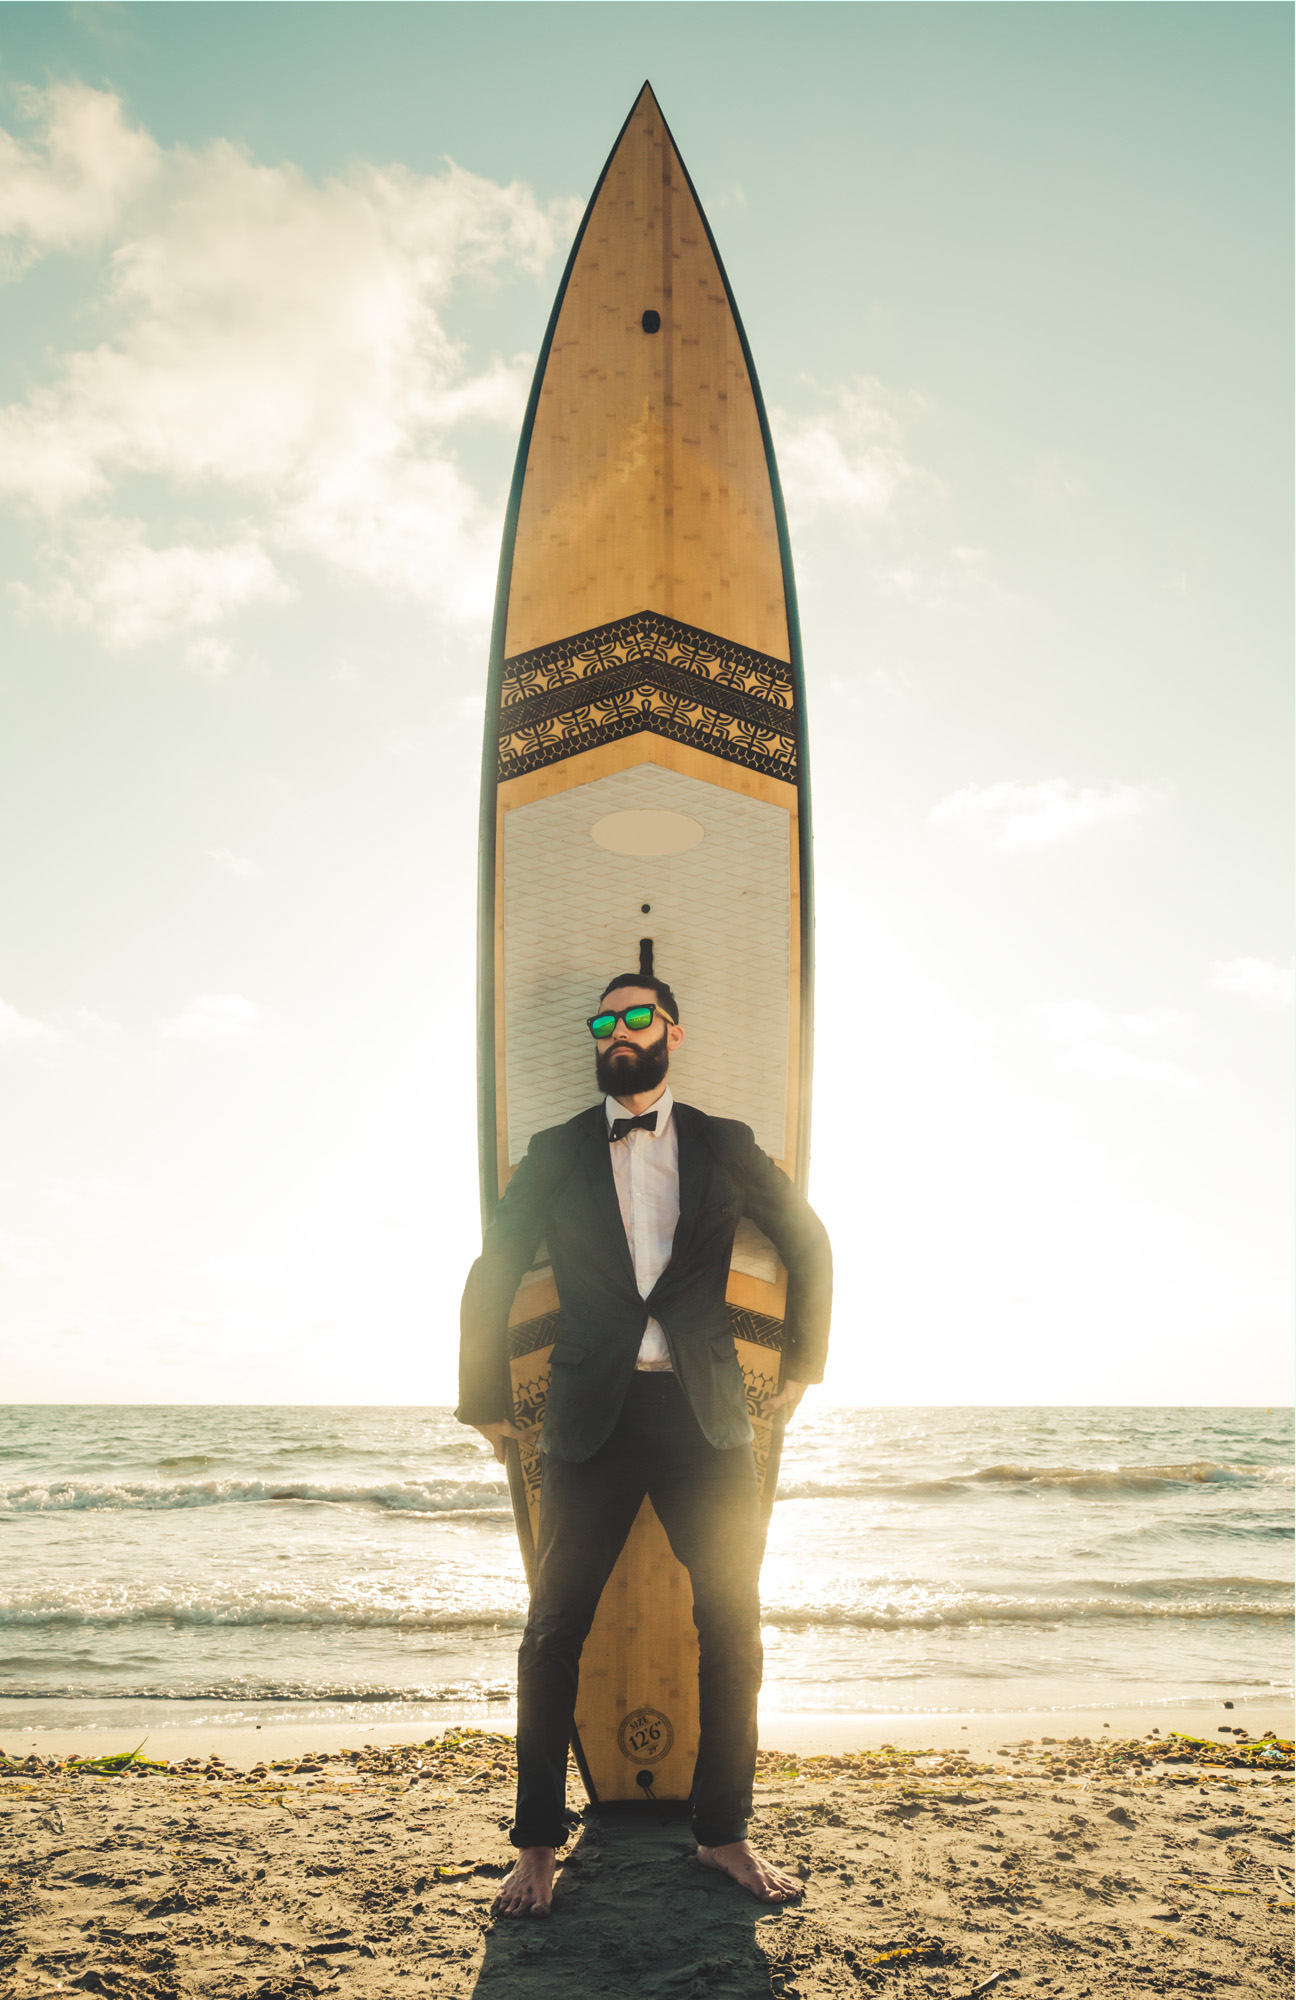 Pablo aracil playa